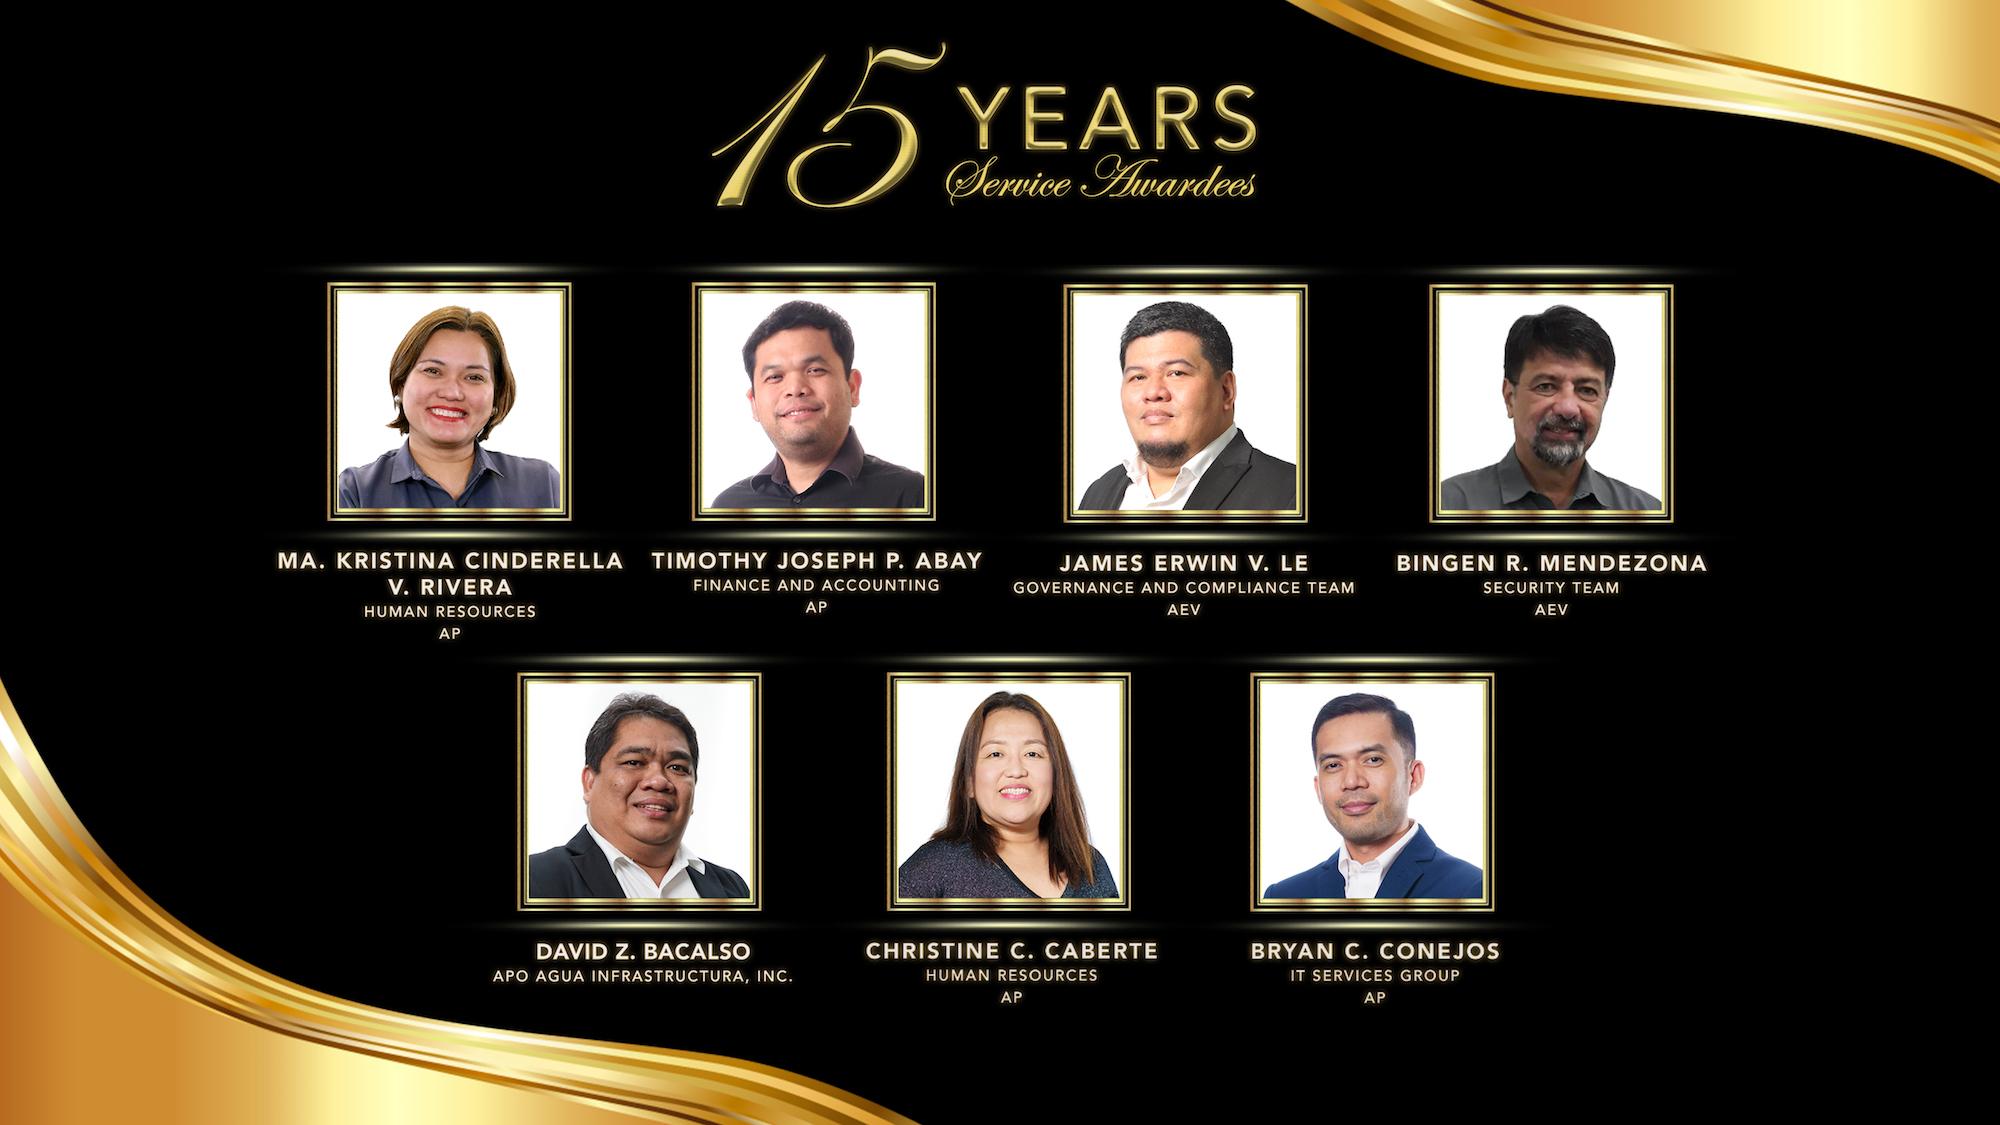 EIA Deck 15 years awardee 2